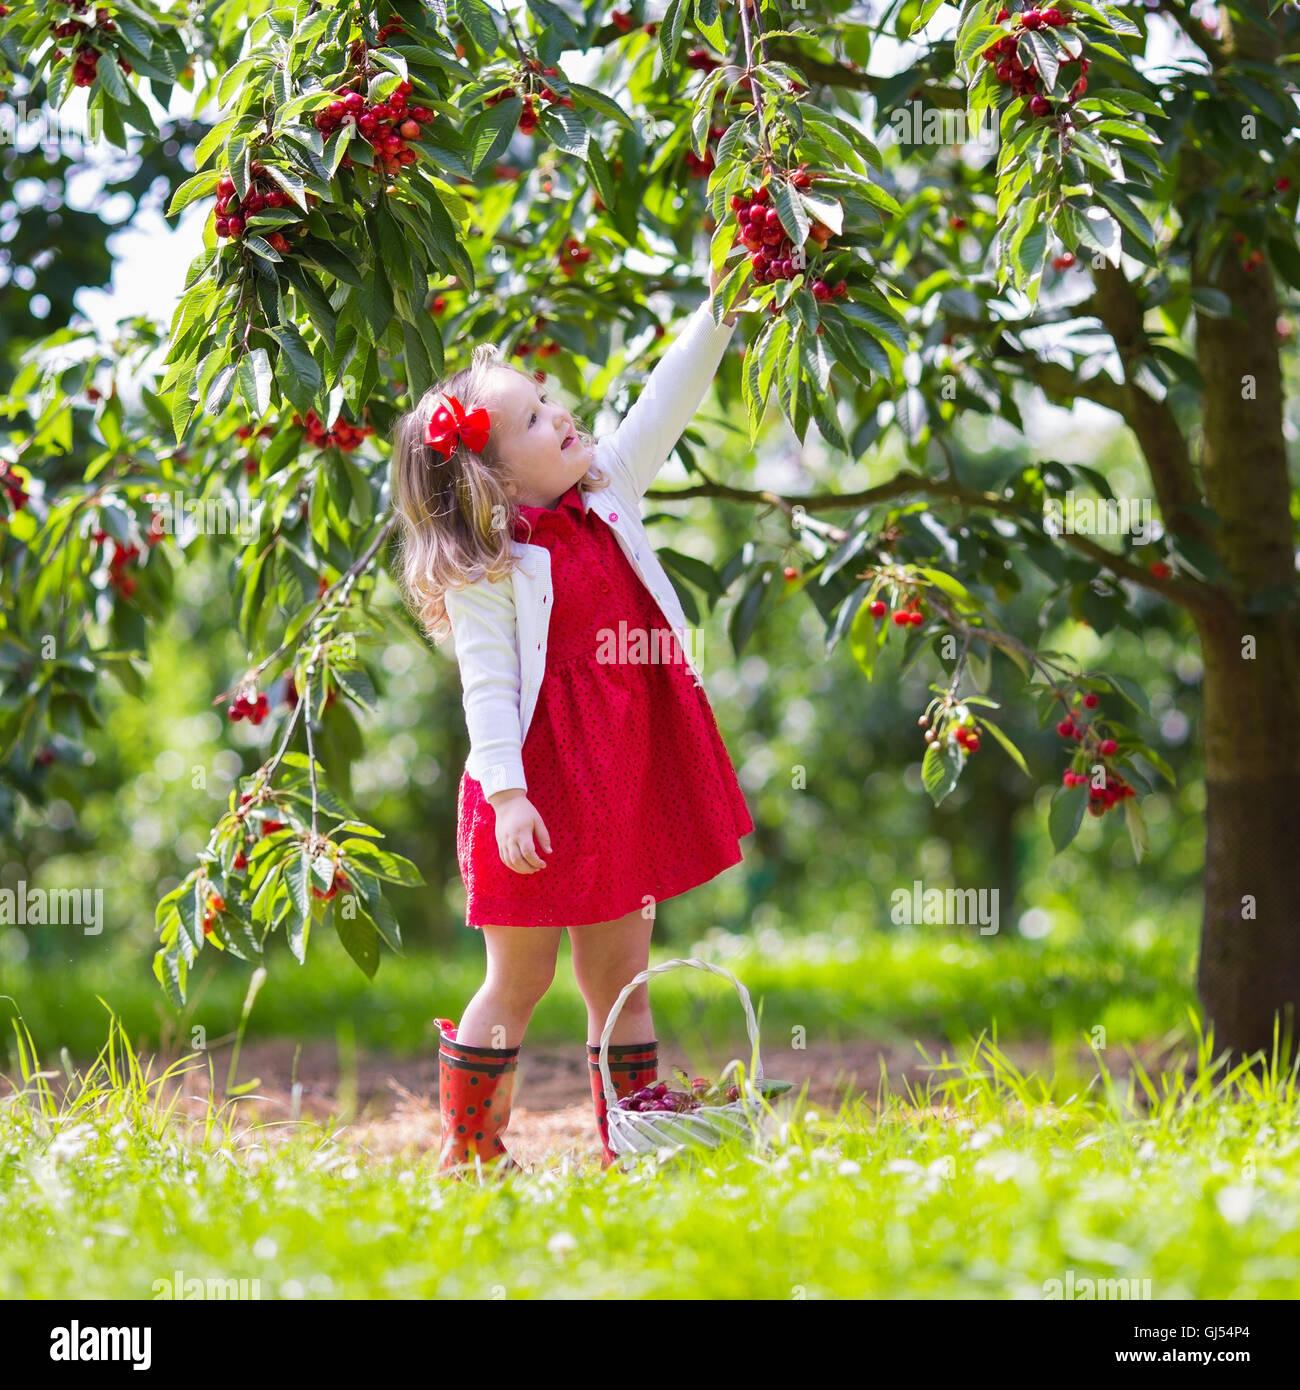 34   Cool fruit farm for Fruit Farm Photography  588gtk